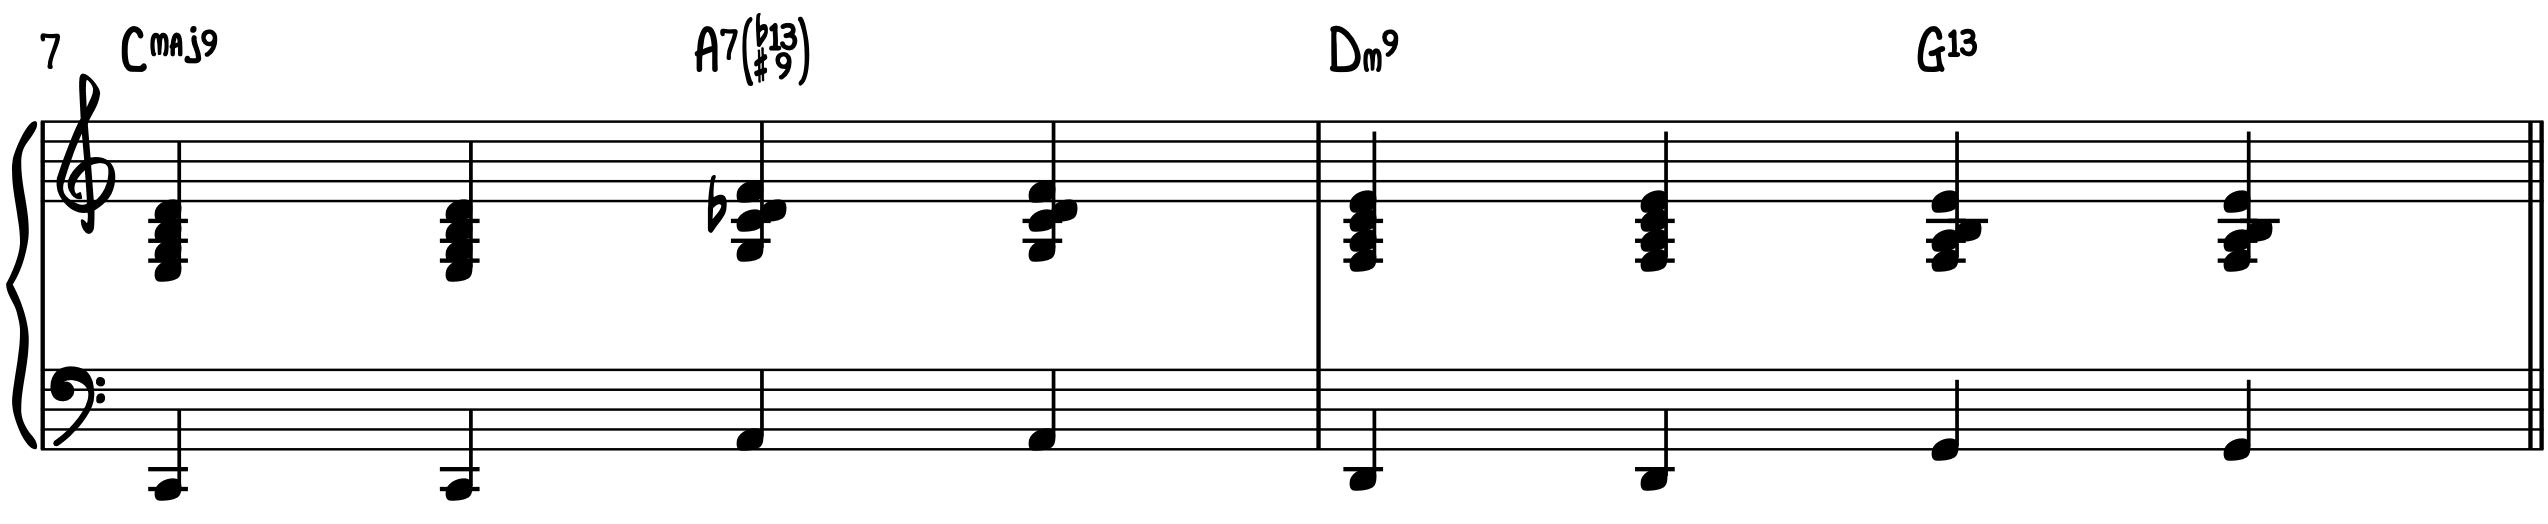 Blue Moon 4-On-The-Floor jazz piano accompaniment